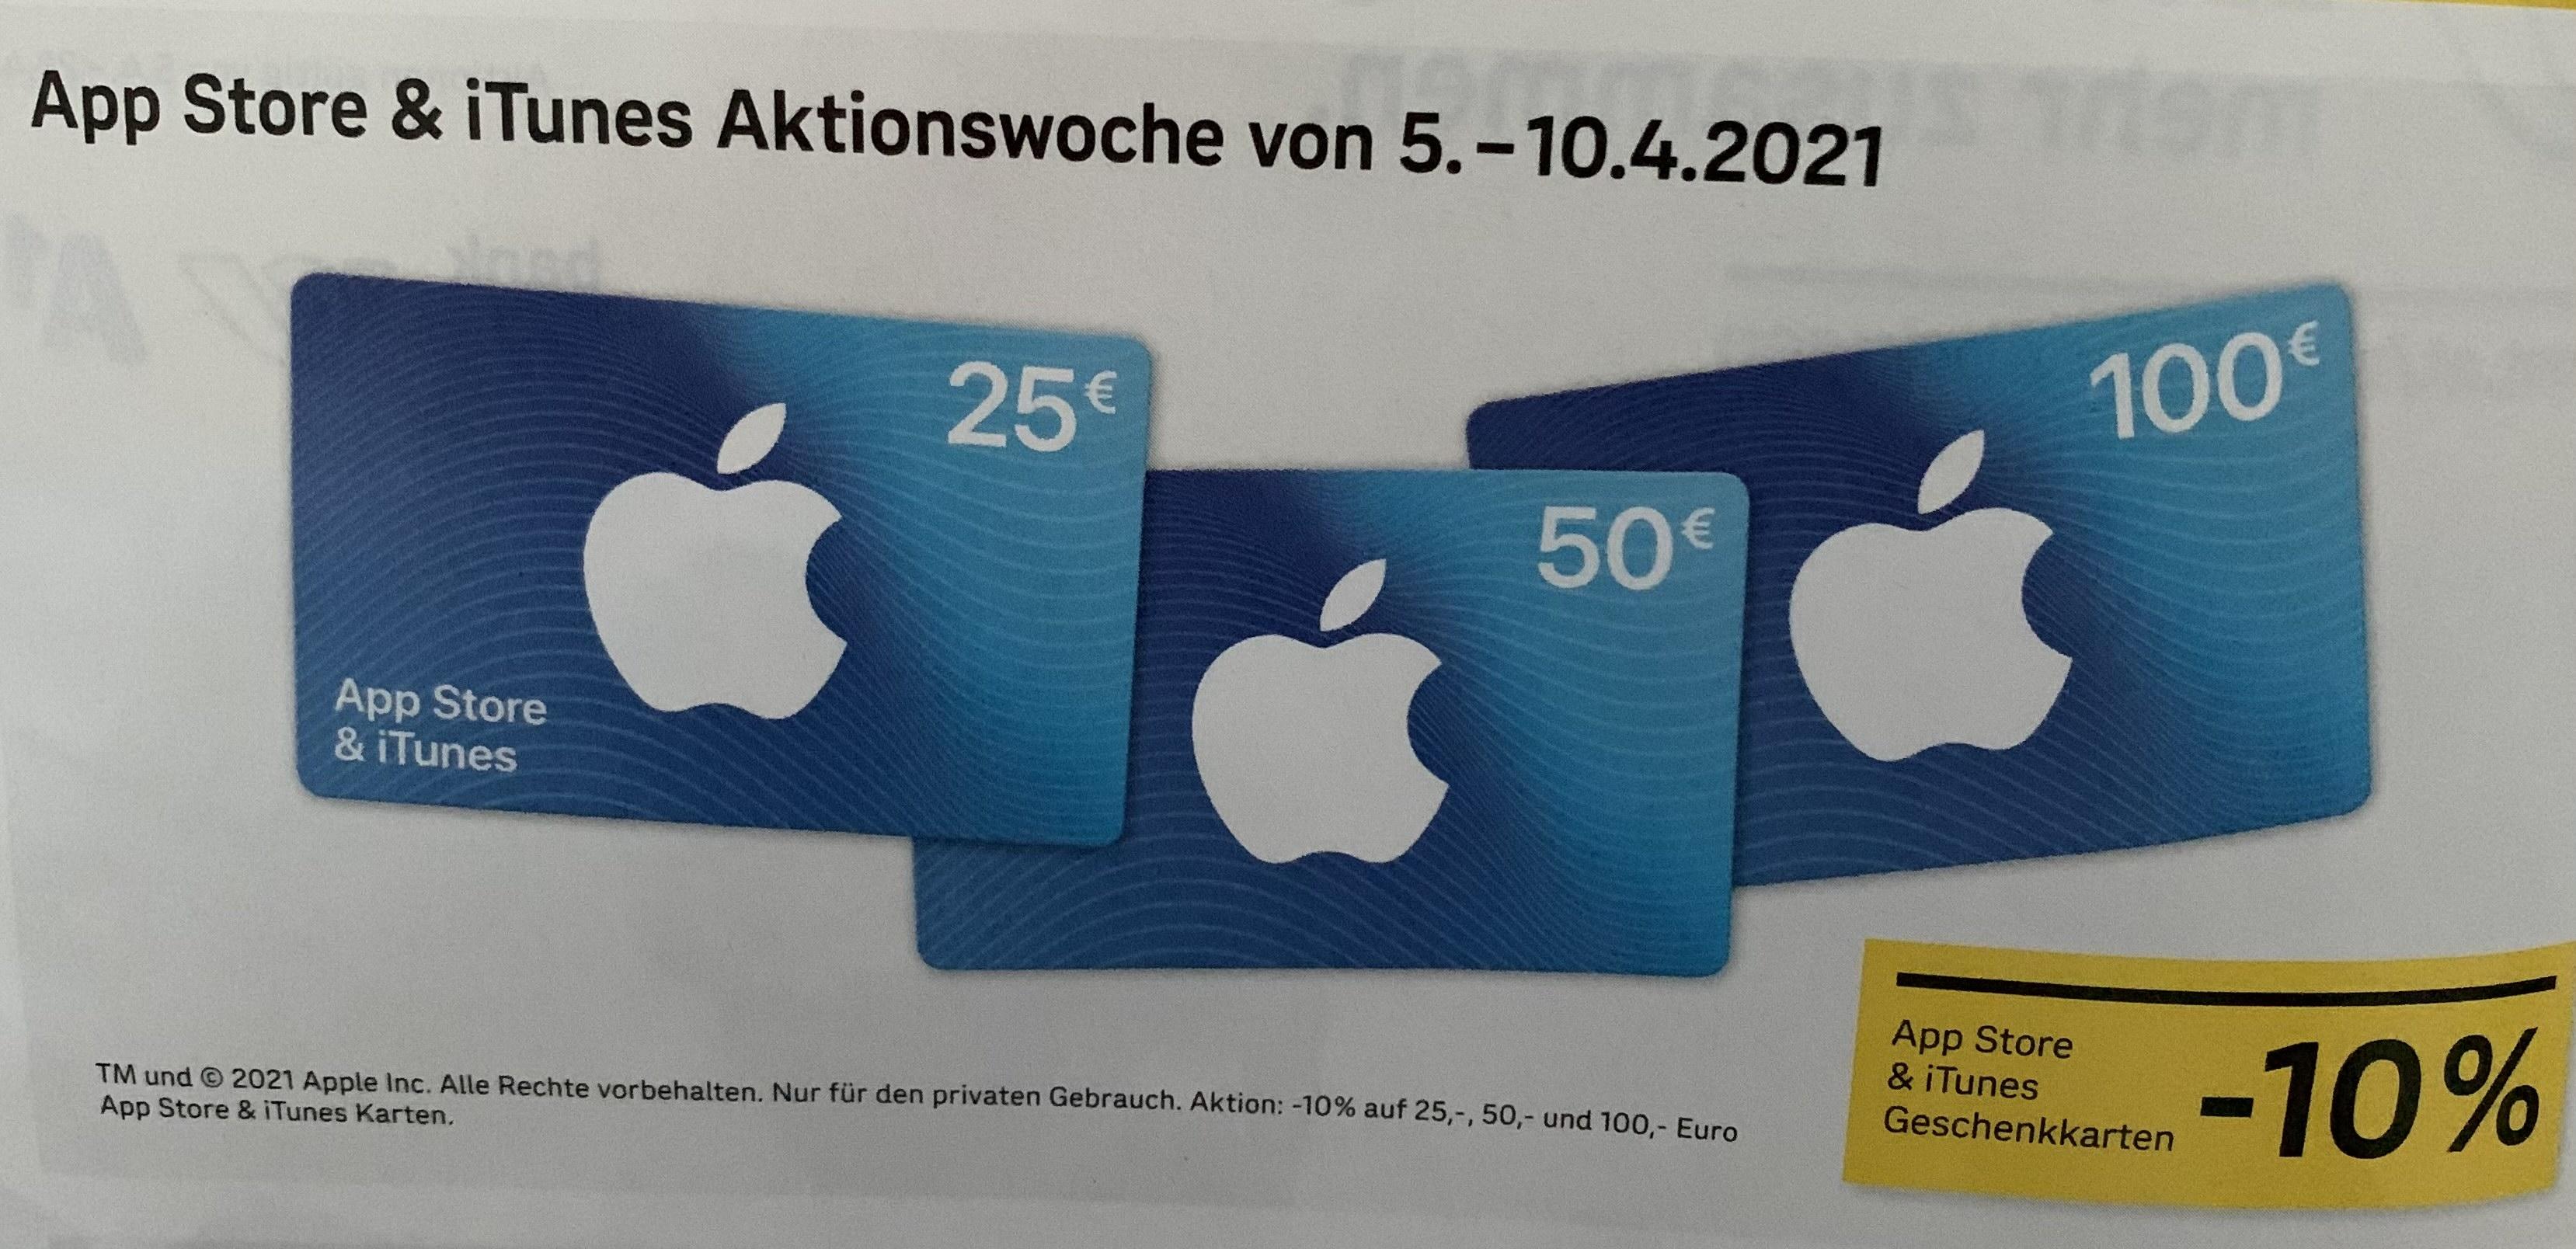 10% auf 25/50/100 Apple App Store & ITunes Karten